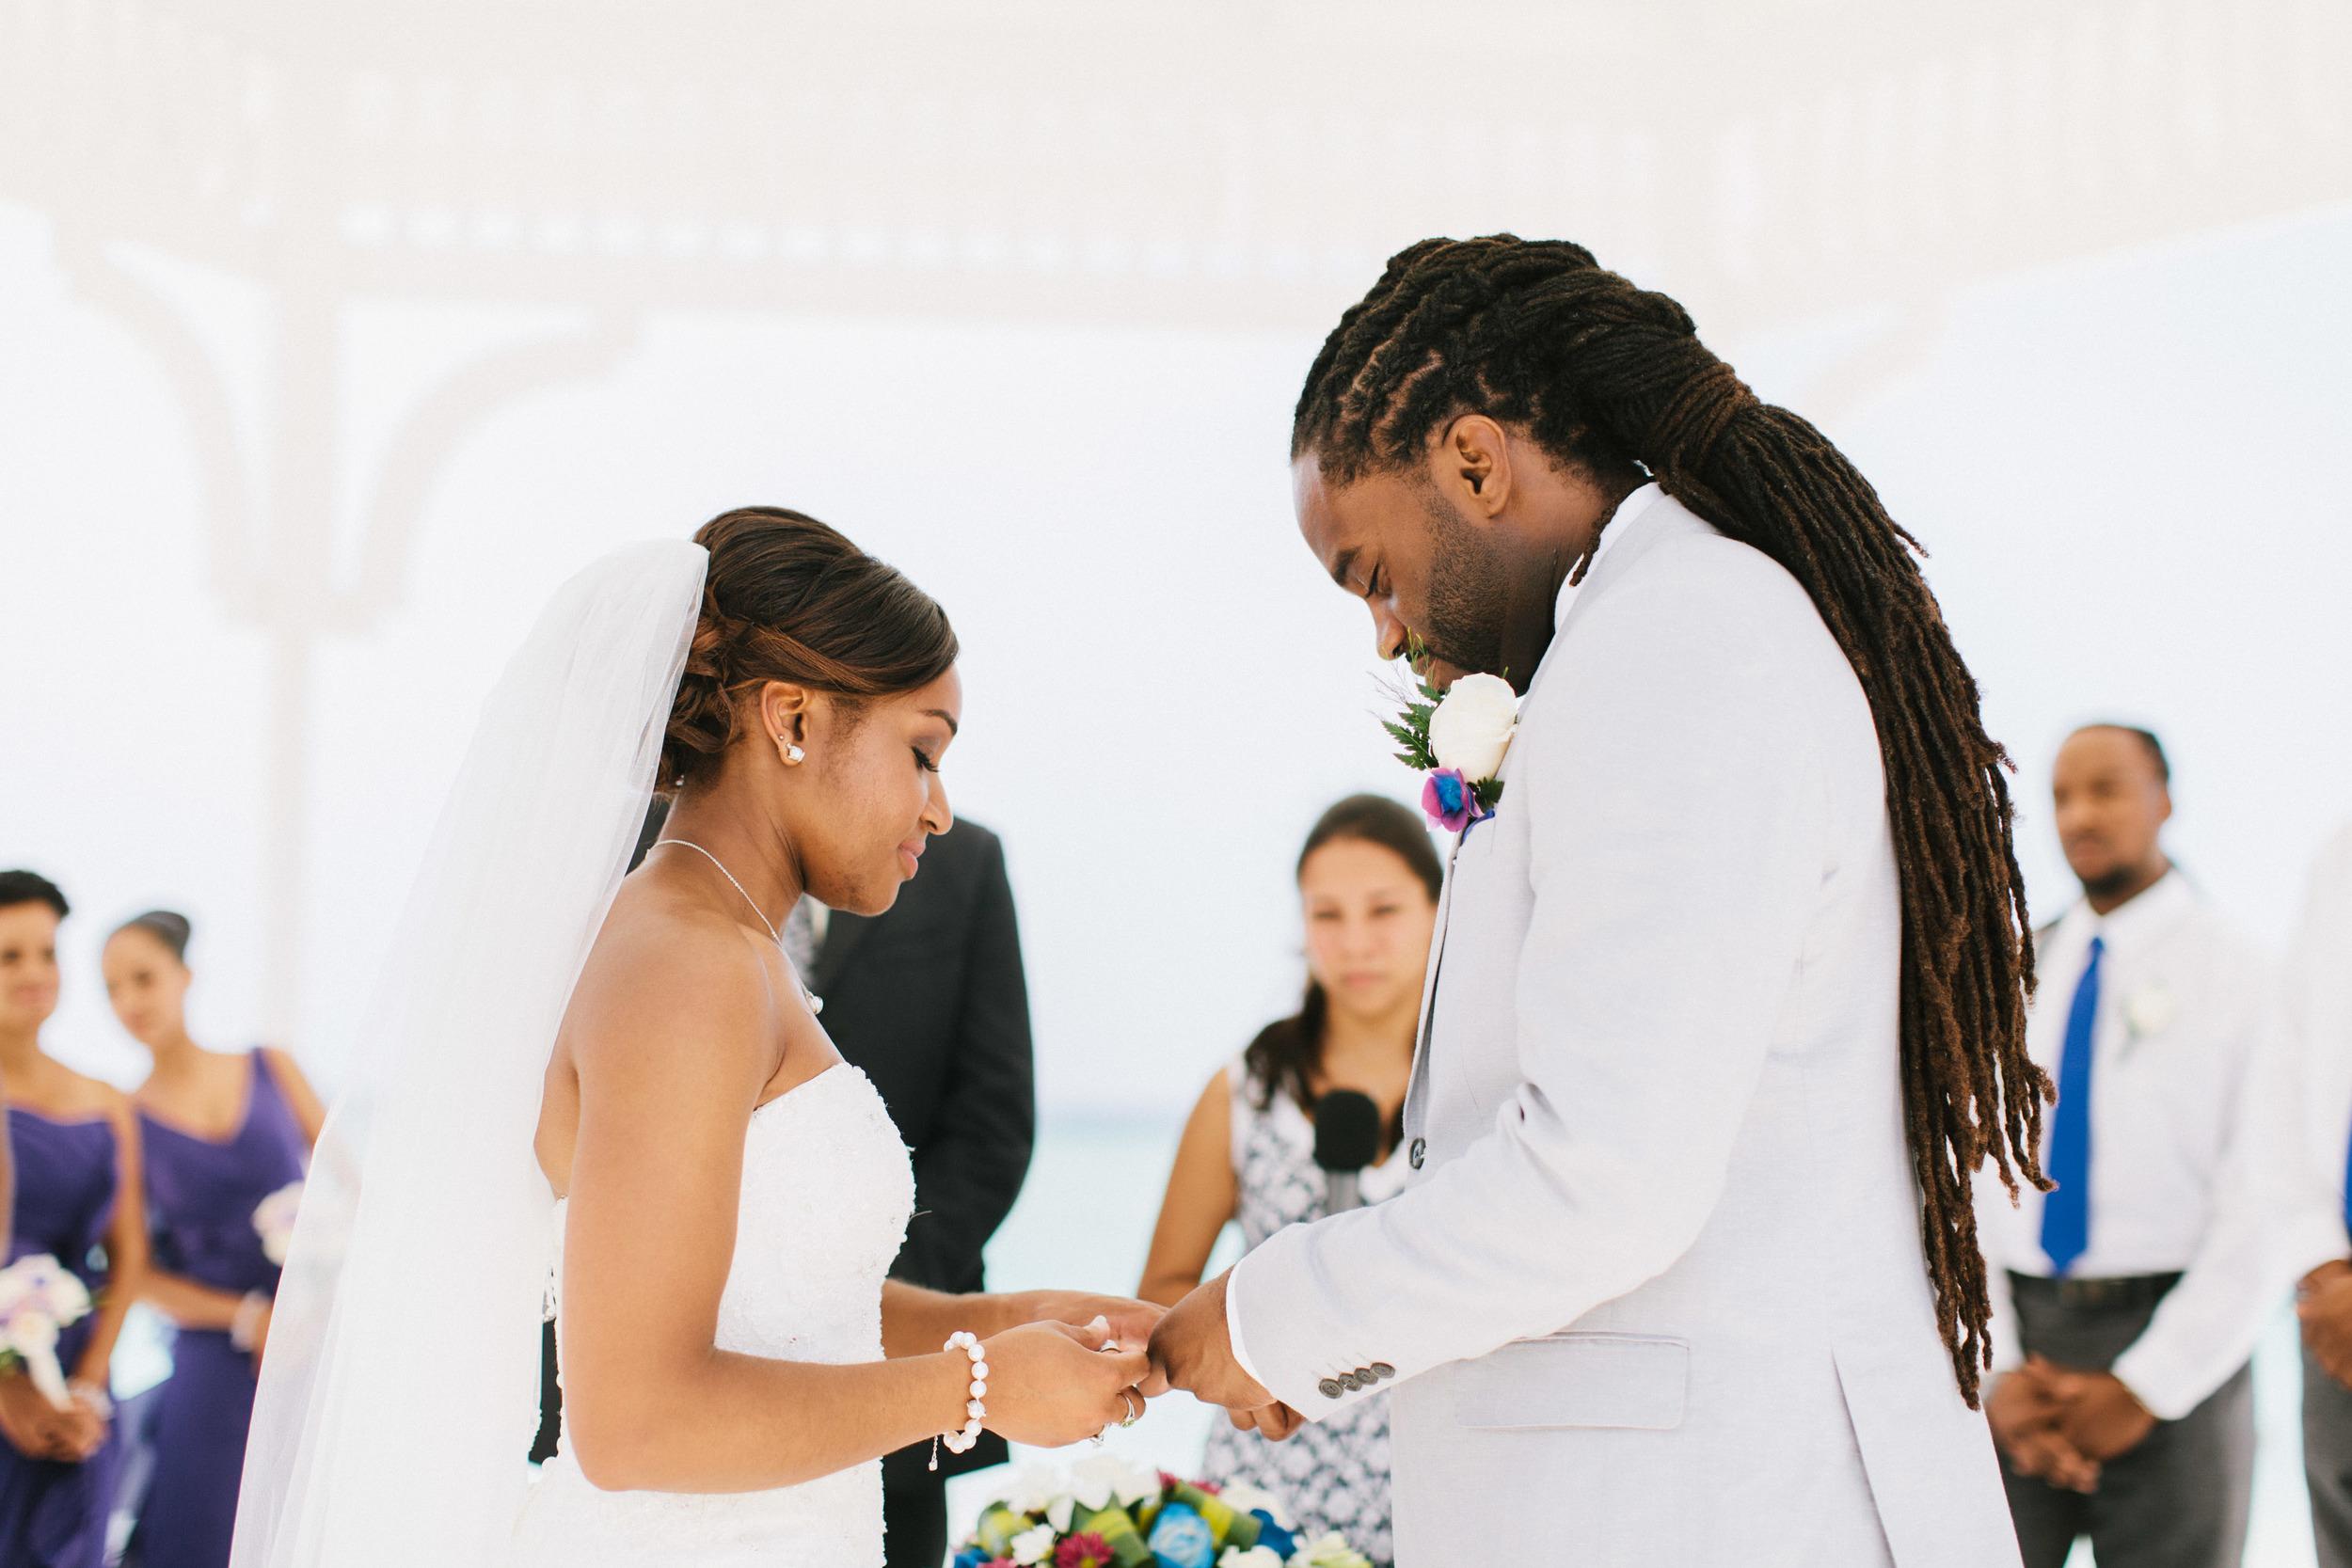 michael-rousseau-photography-dominican-republic-destination-wedding-cara-jason-colonial-majestic-dominican-republic074.jpg